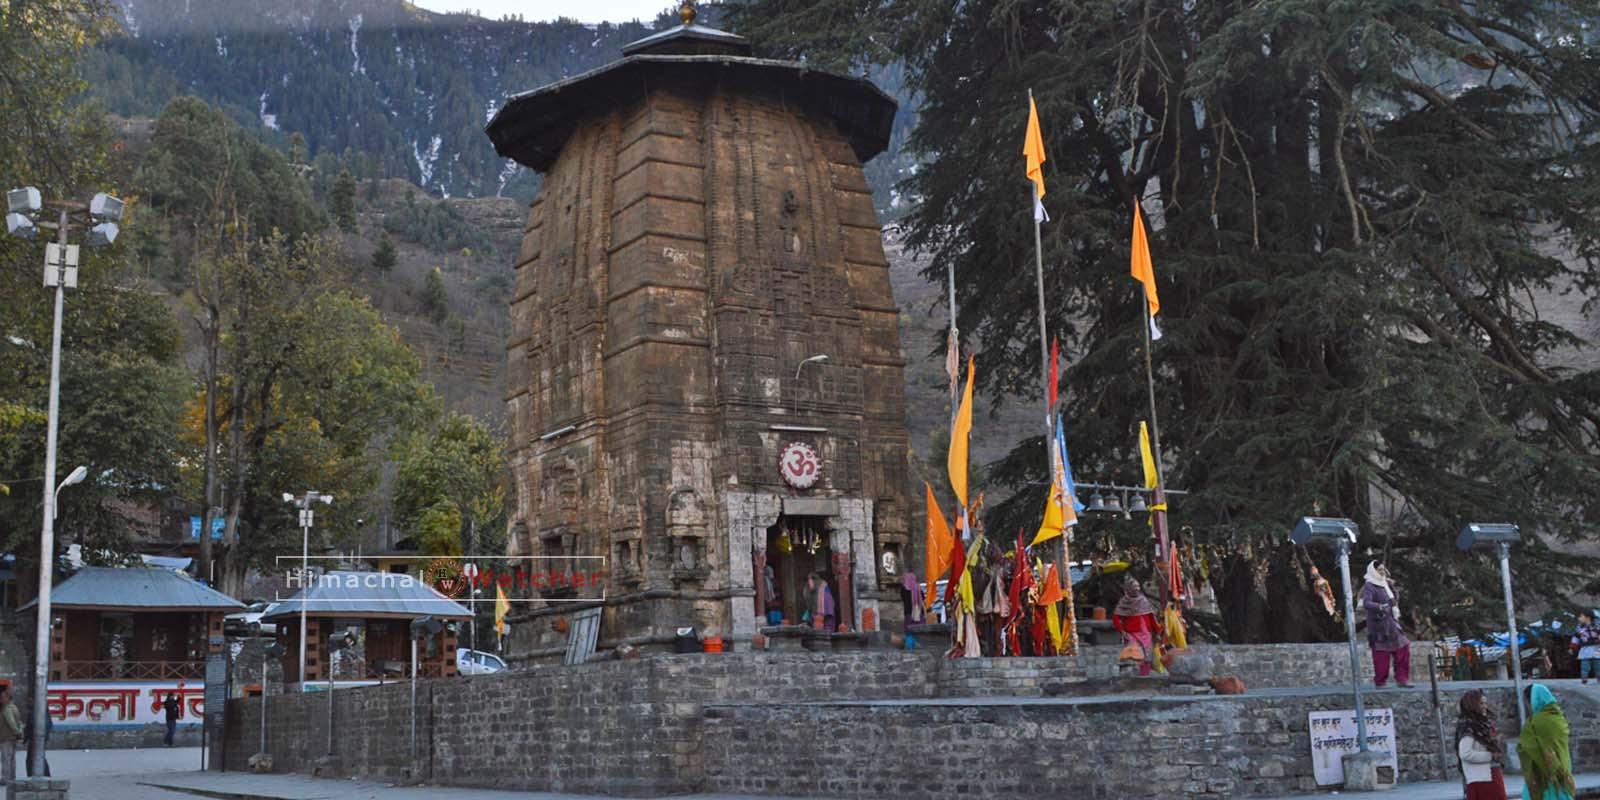 Himachal Pradesh Temples Opening Postponed